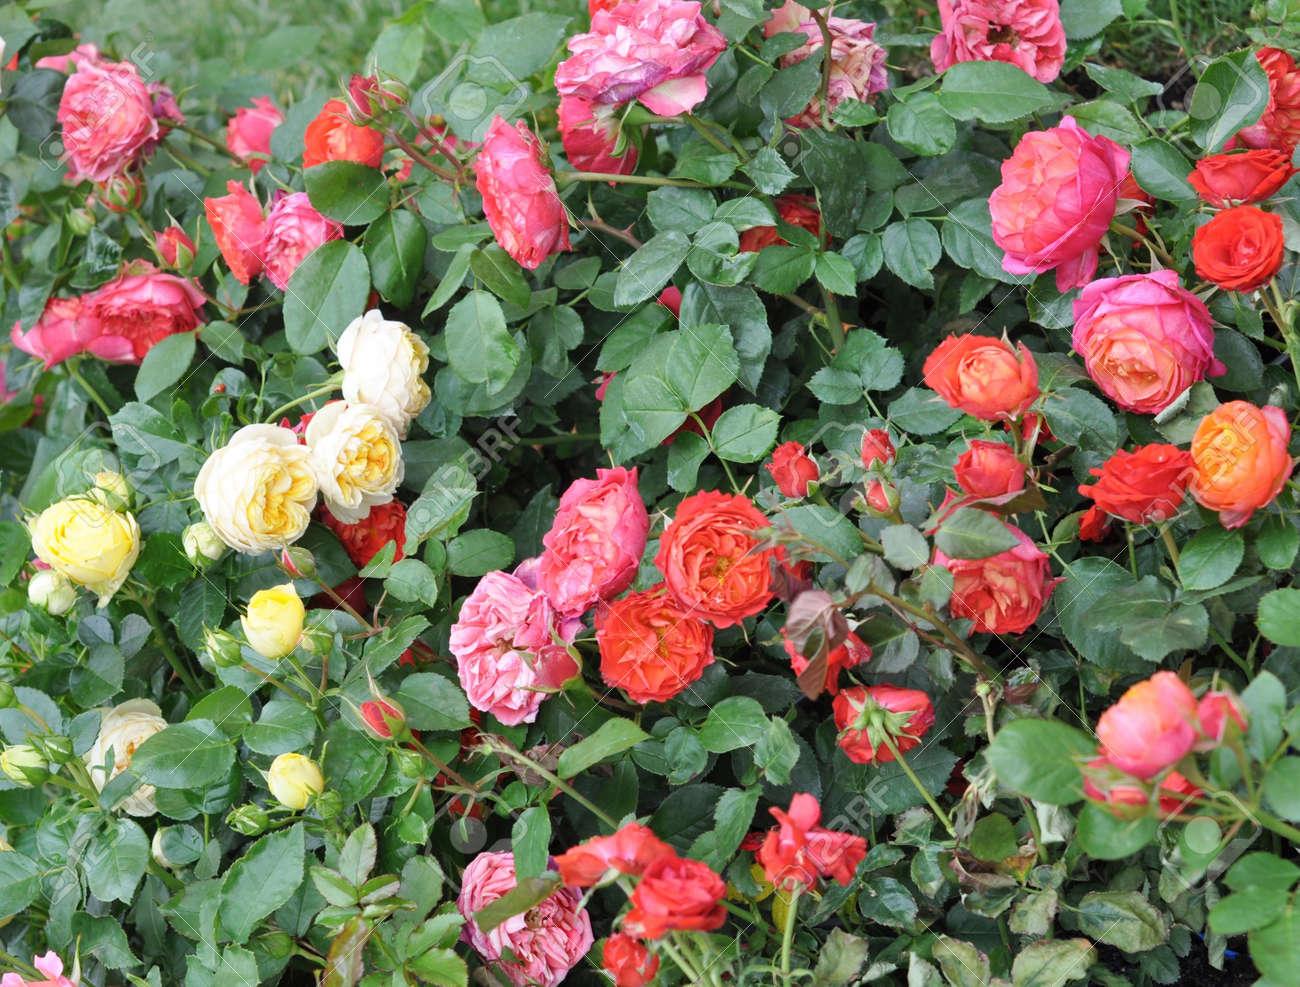 Rose perennial flower shrub vine of genus rosa rosaceae stock photo rose perennial flower shrub vine of genus rosa rosaceae stock photo 9724196 mightylinksfo